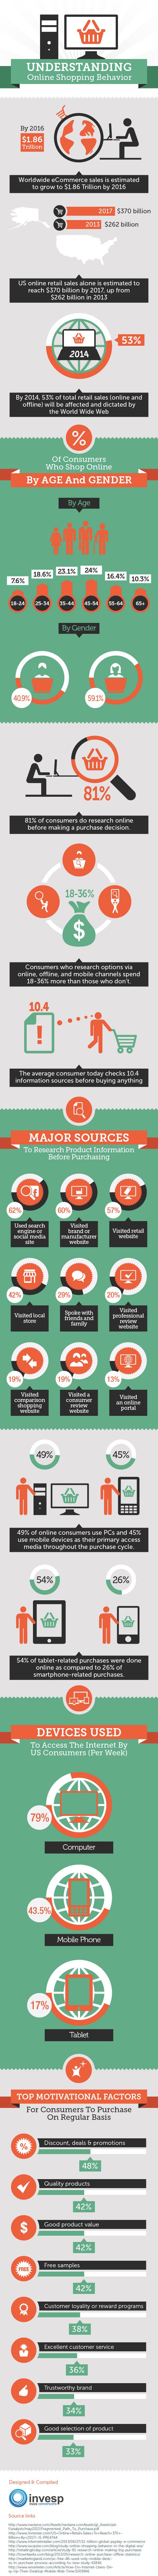 Understanding the online shopping behavior